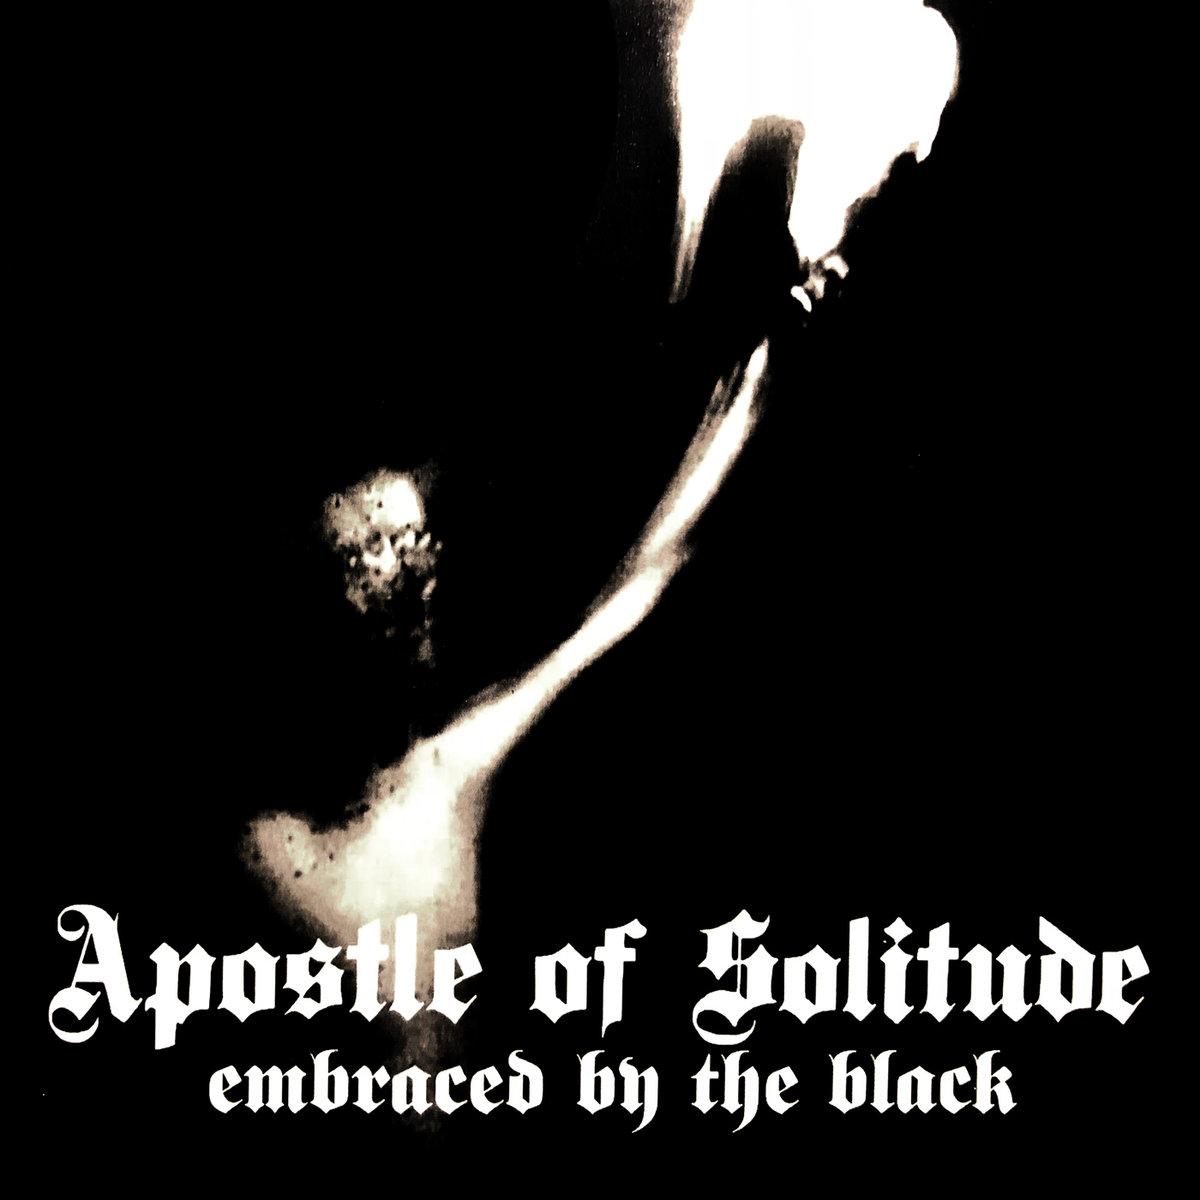 Apostle of Solitude